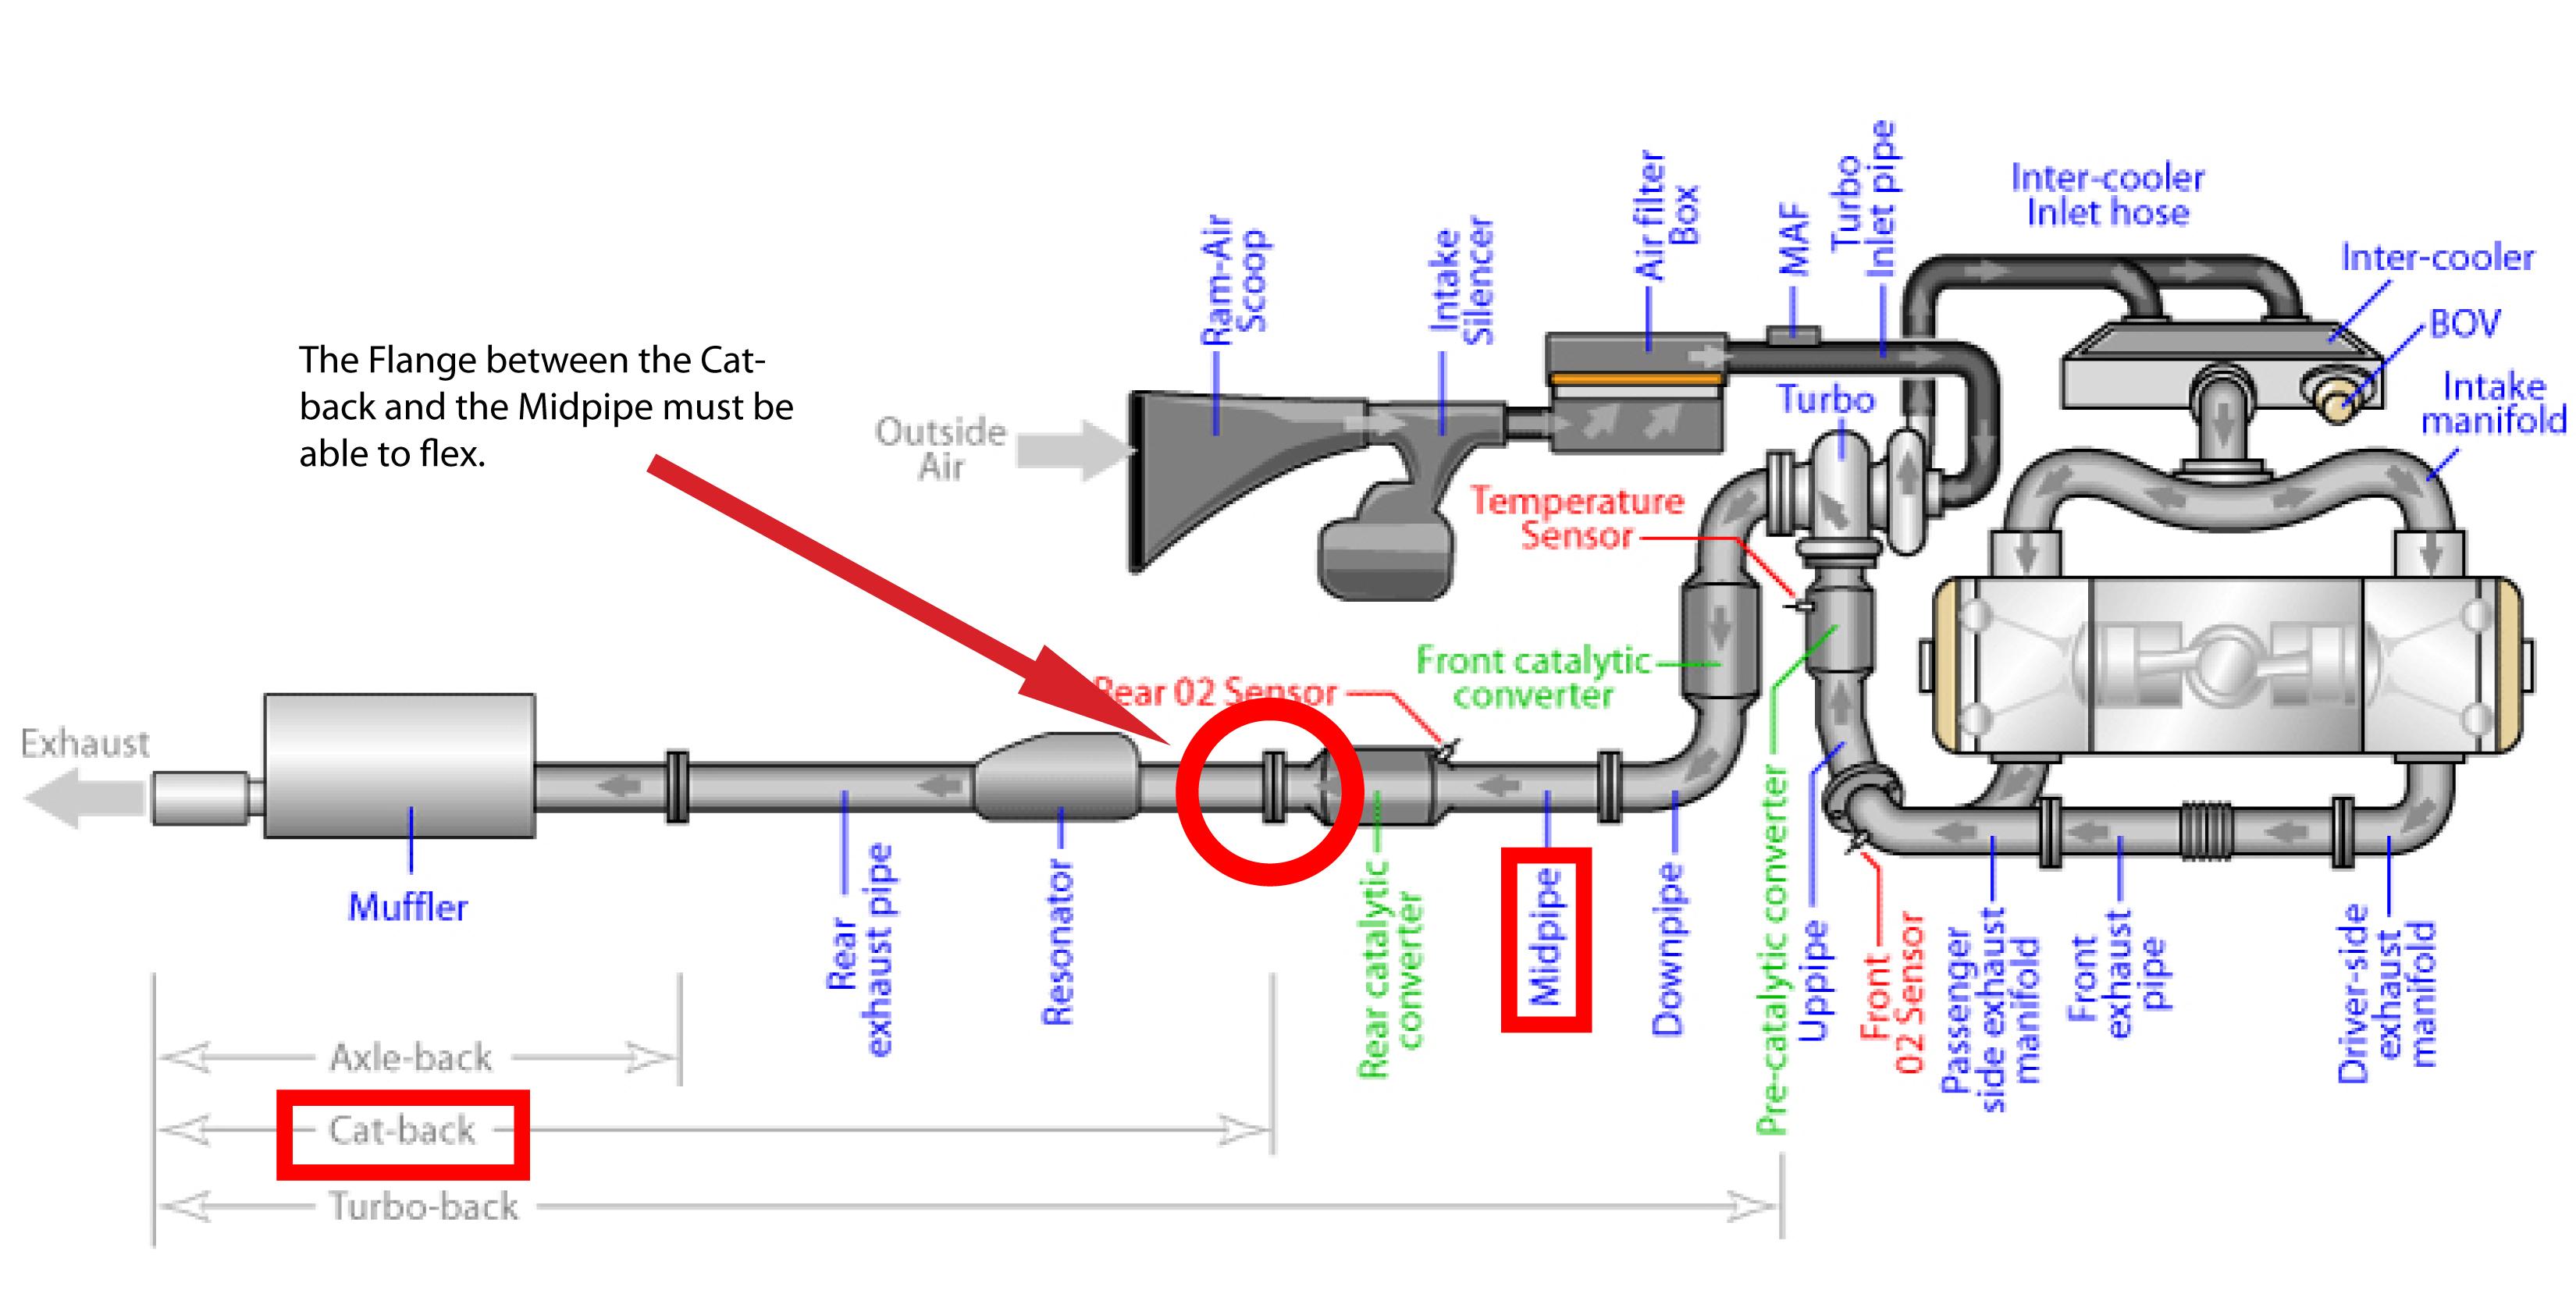 Subaru Exhaust Leak Repair: 4 Steps